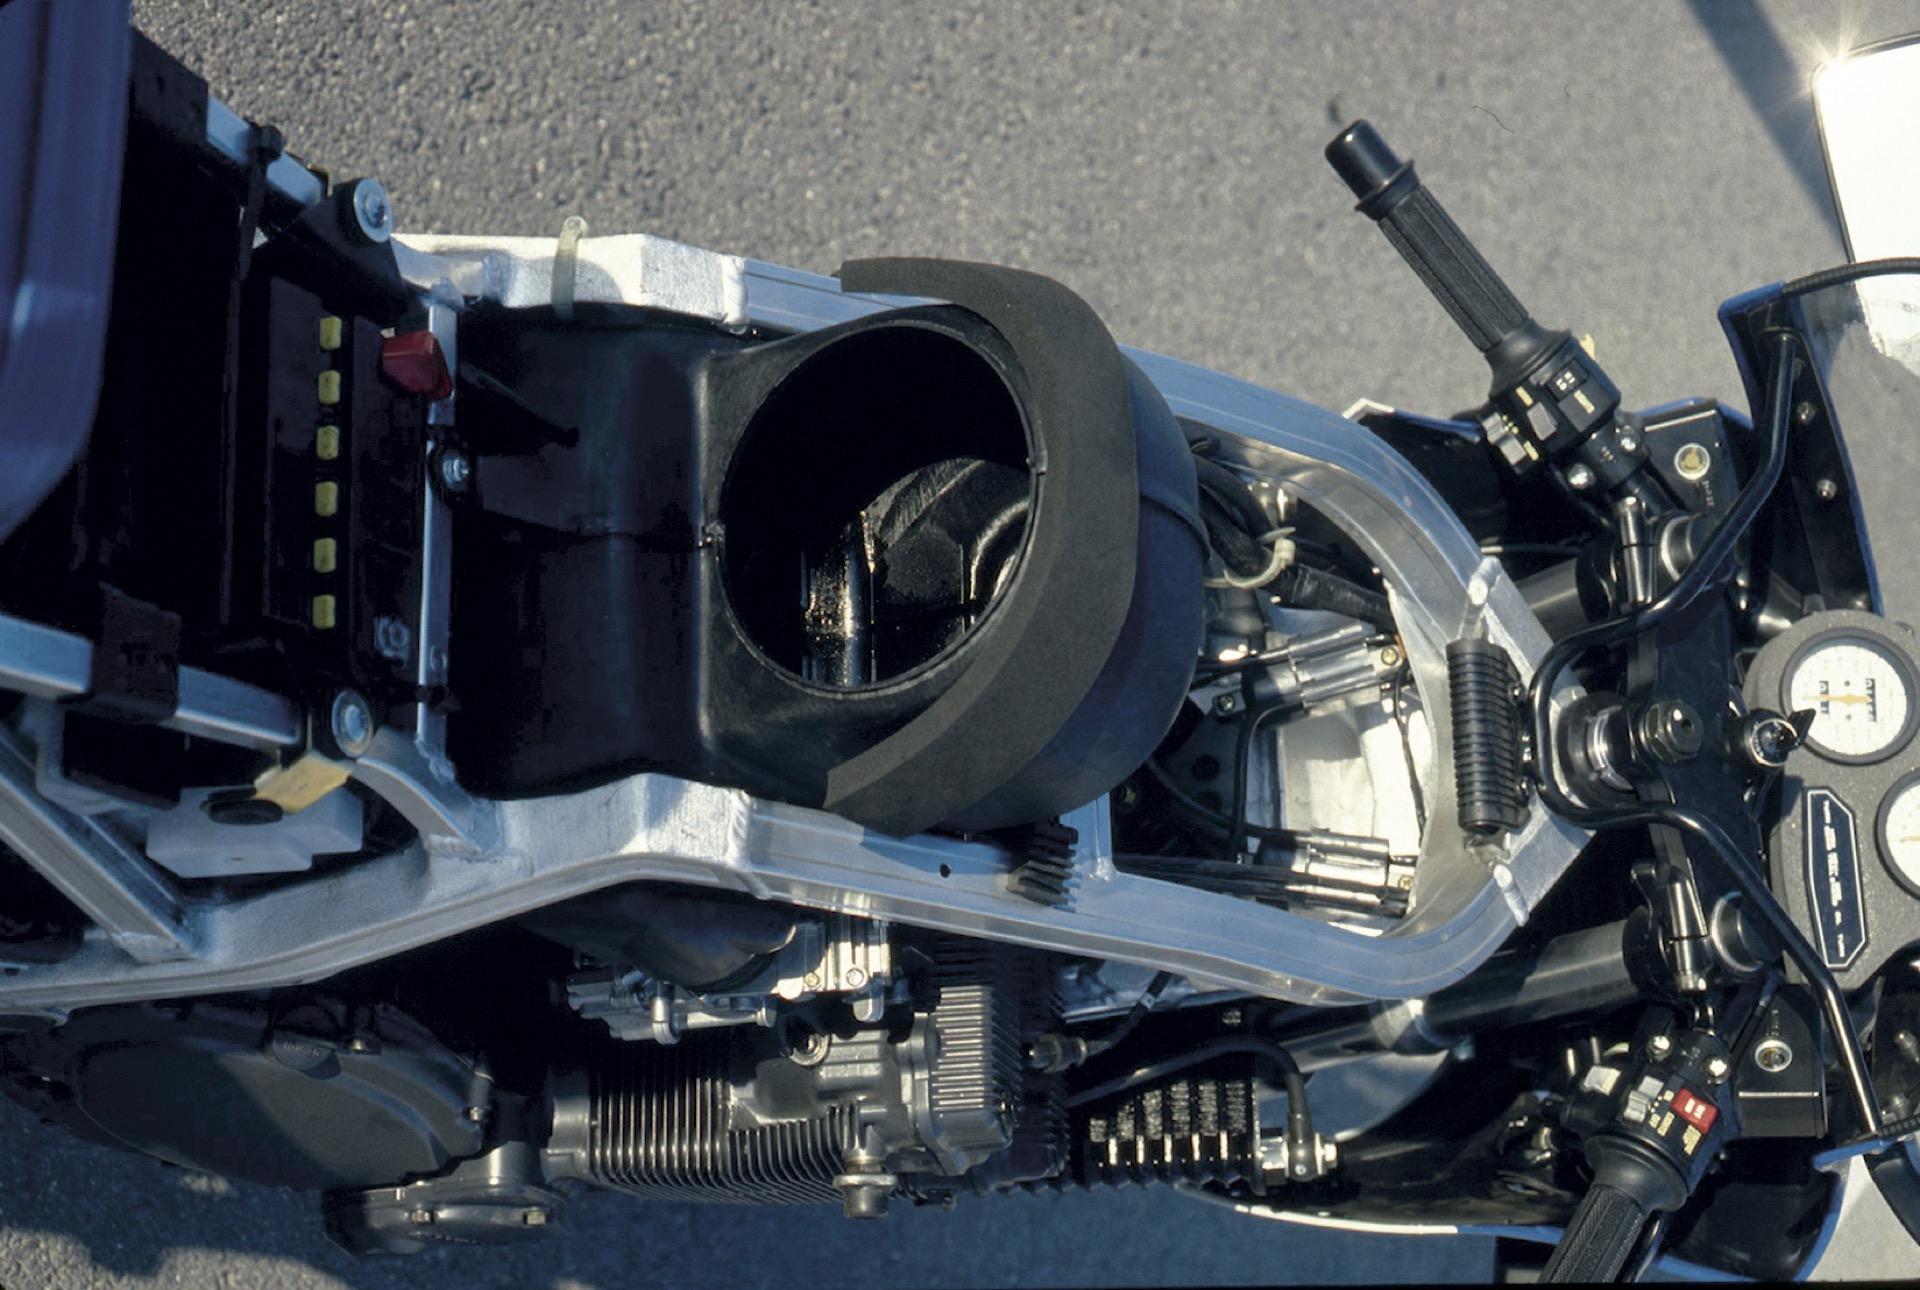 Retroprueba revista Motociclismo: Suzuki GSX 750 R 1985 Paragrapharticle-63156-57d0534b7bc21